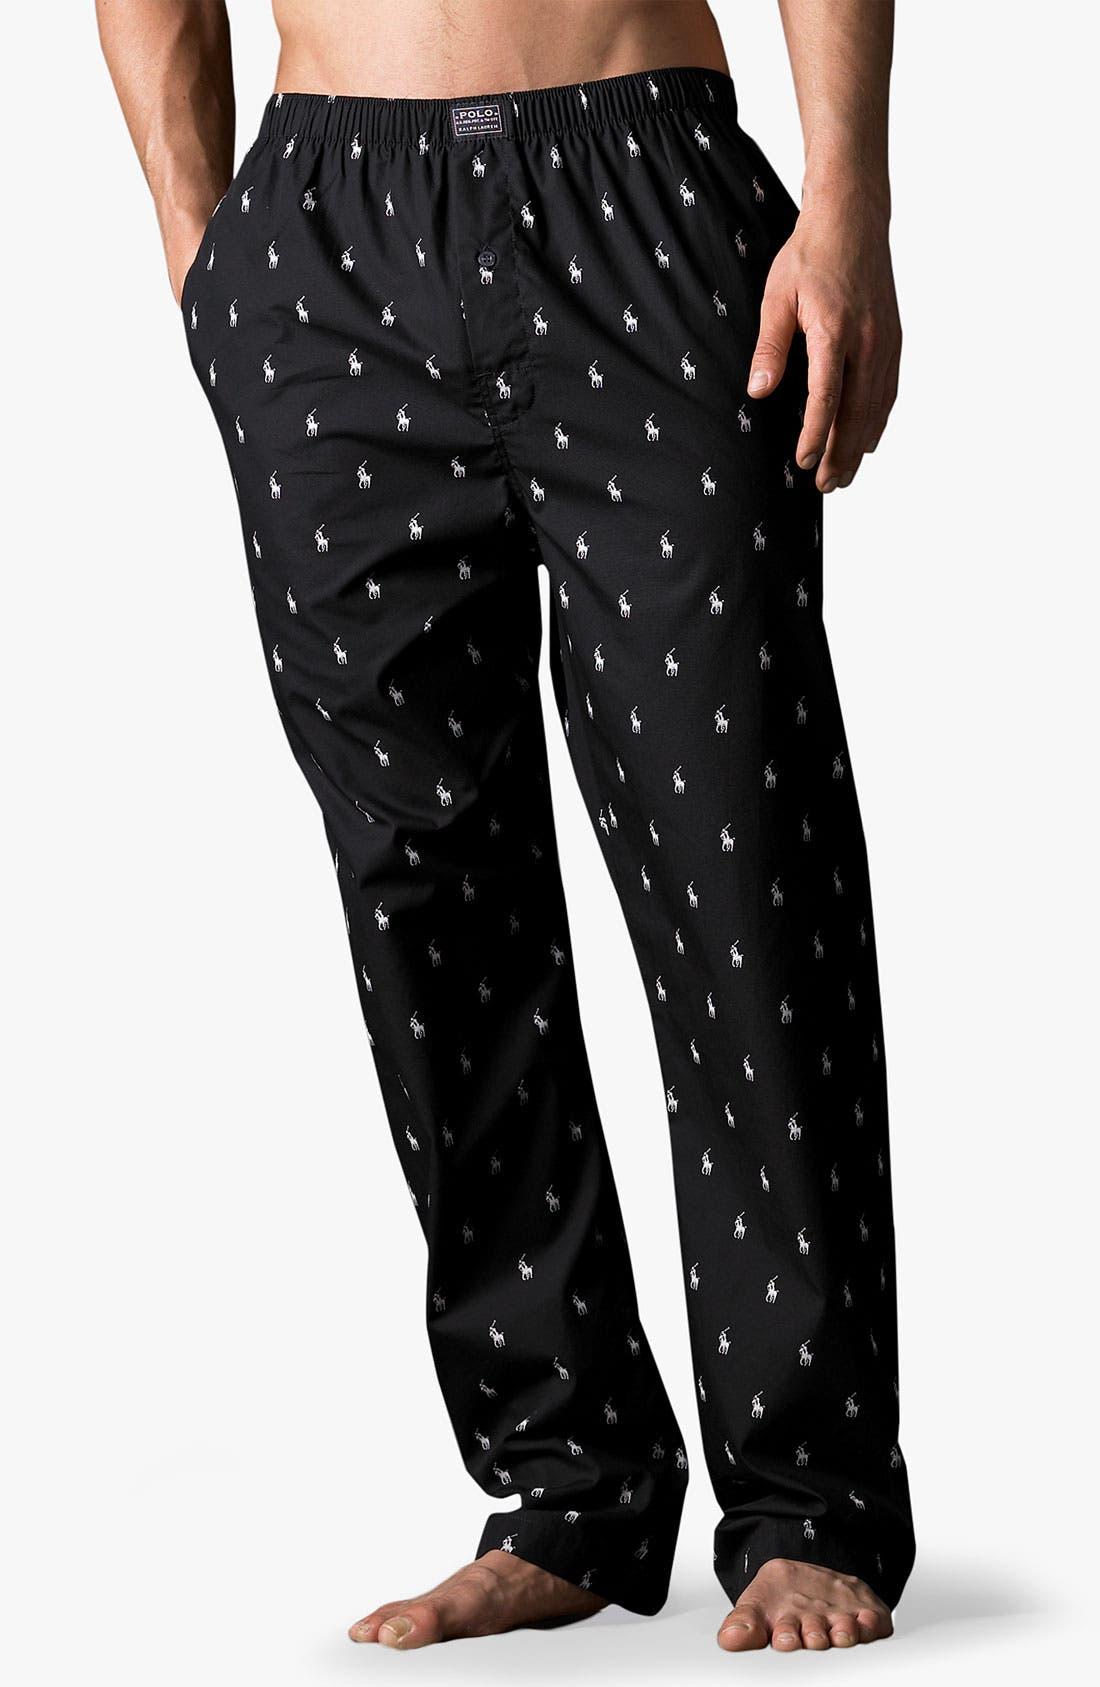 Black dress boots mens pajama pants